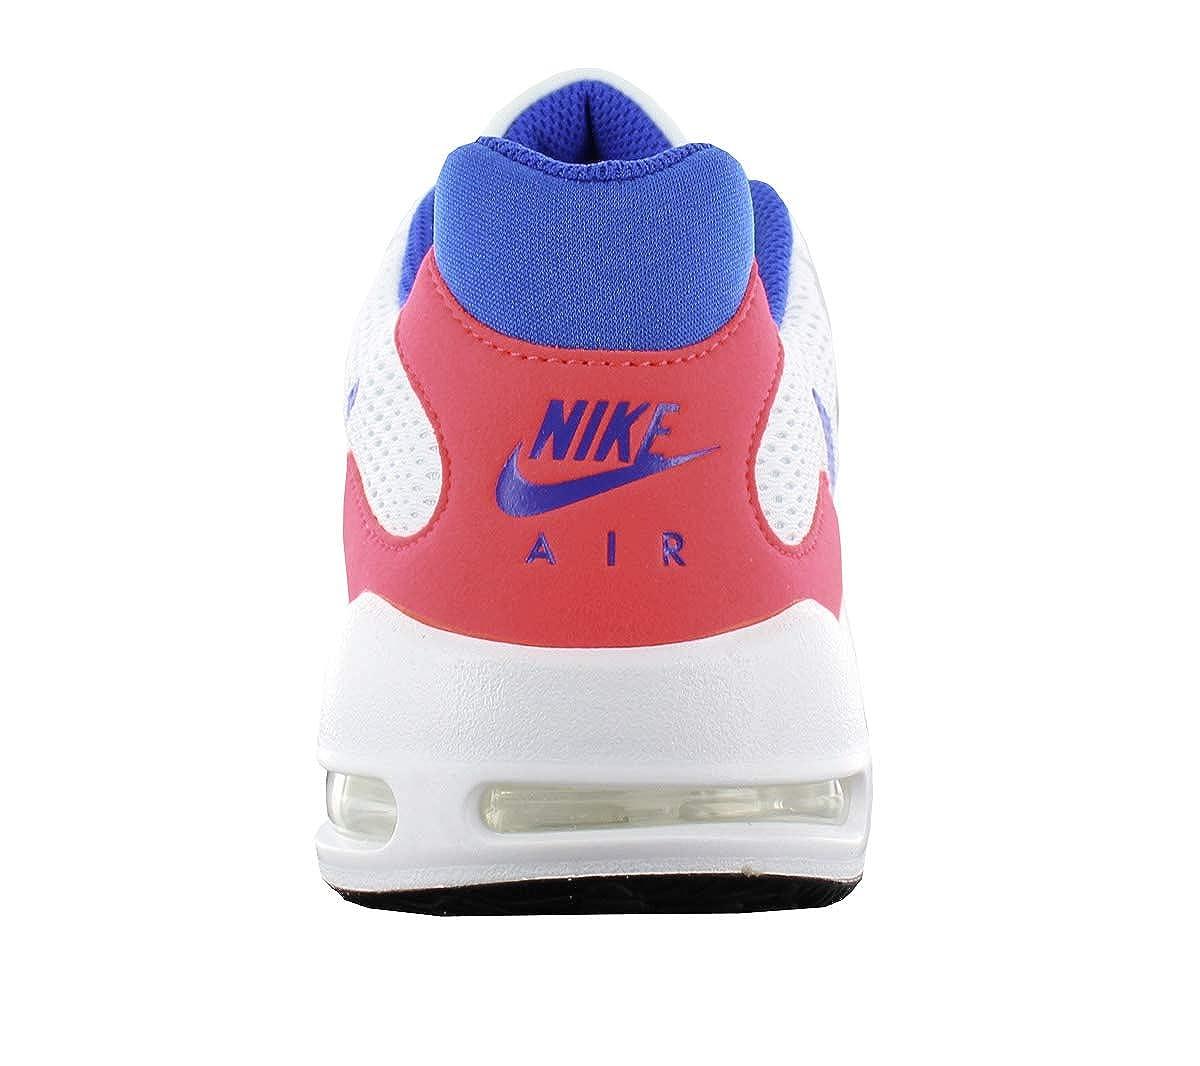 946b5737ee Amazon.com   Nike Men's Air Max Guile -Blue Sneakers   Athletic